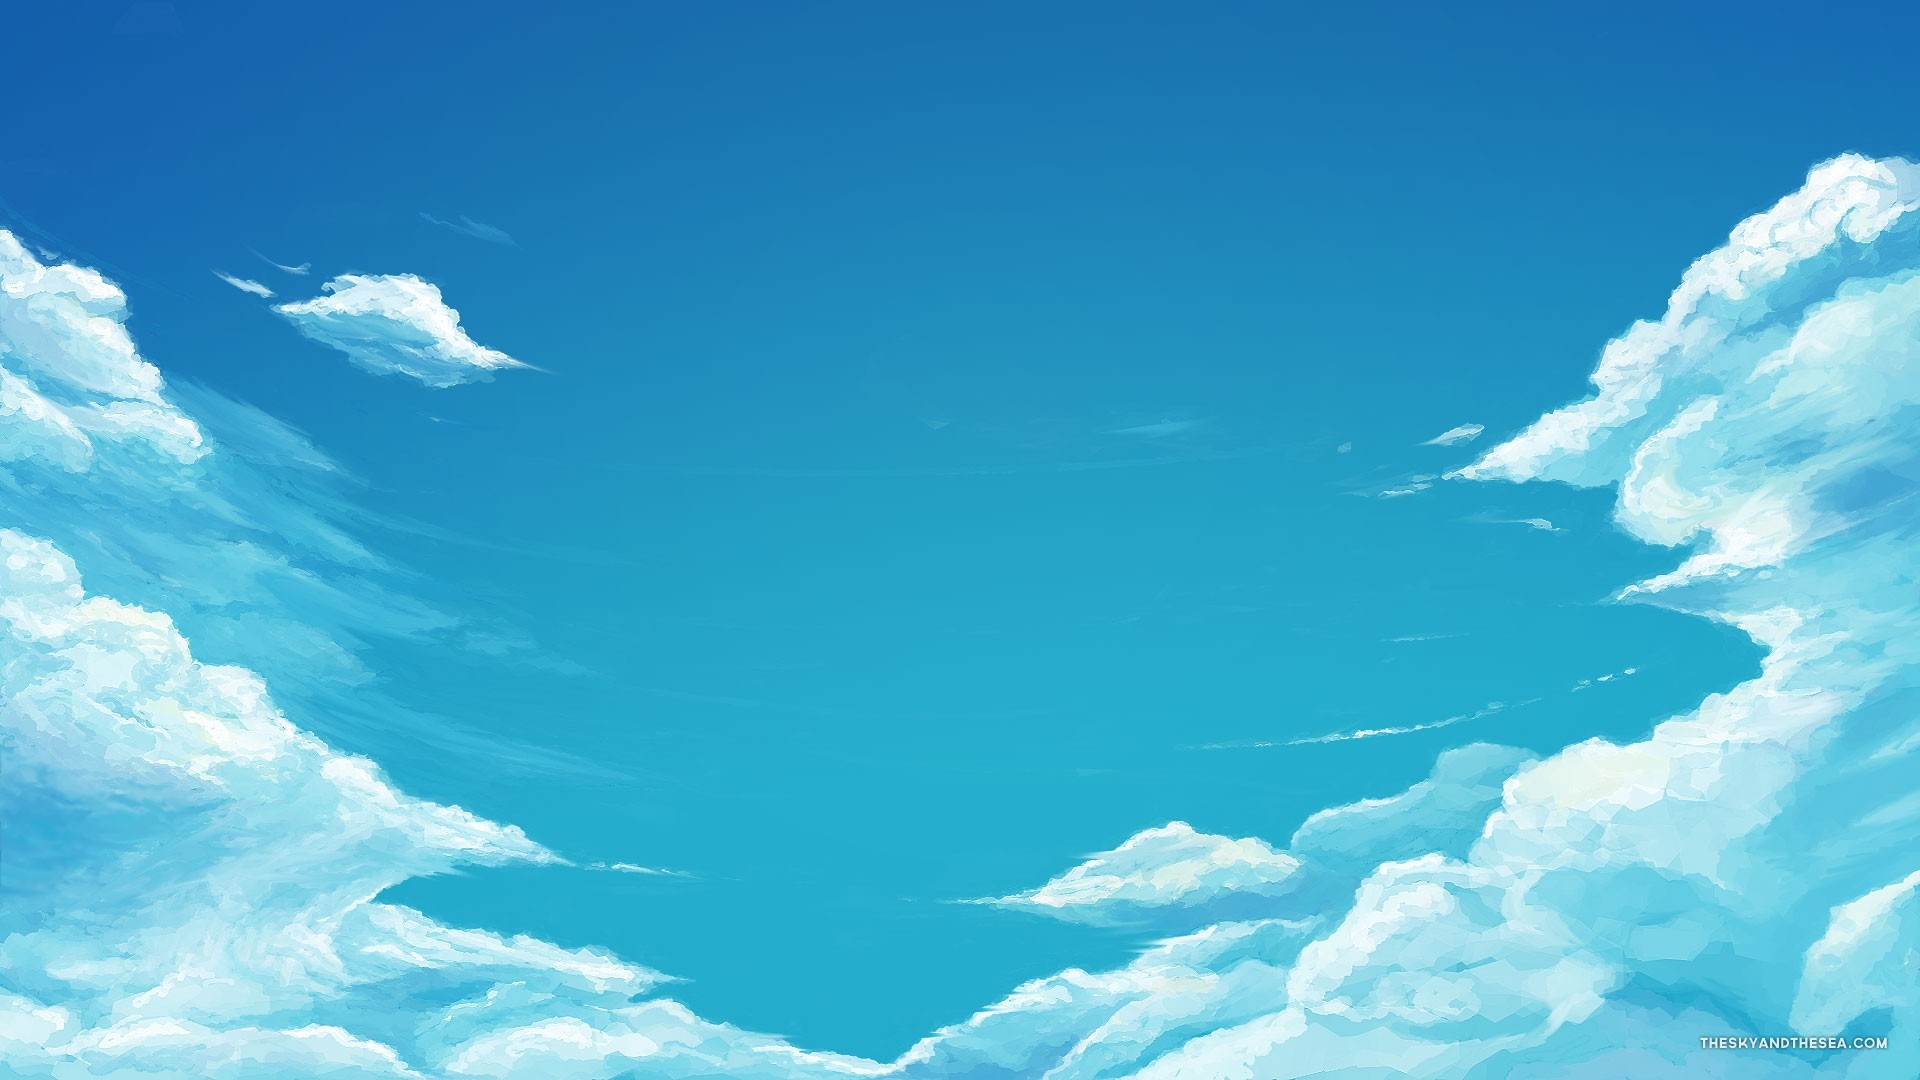 Blue Cloud PC Wallpaper